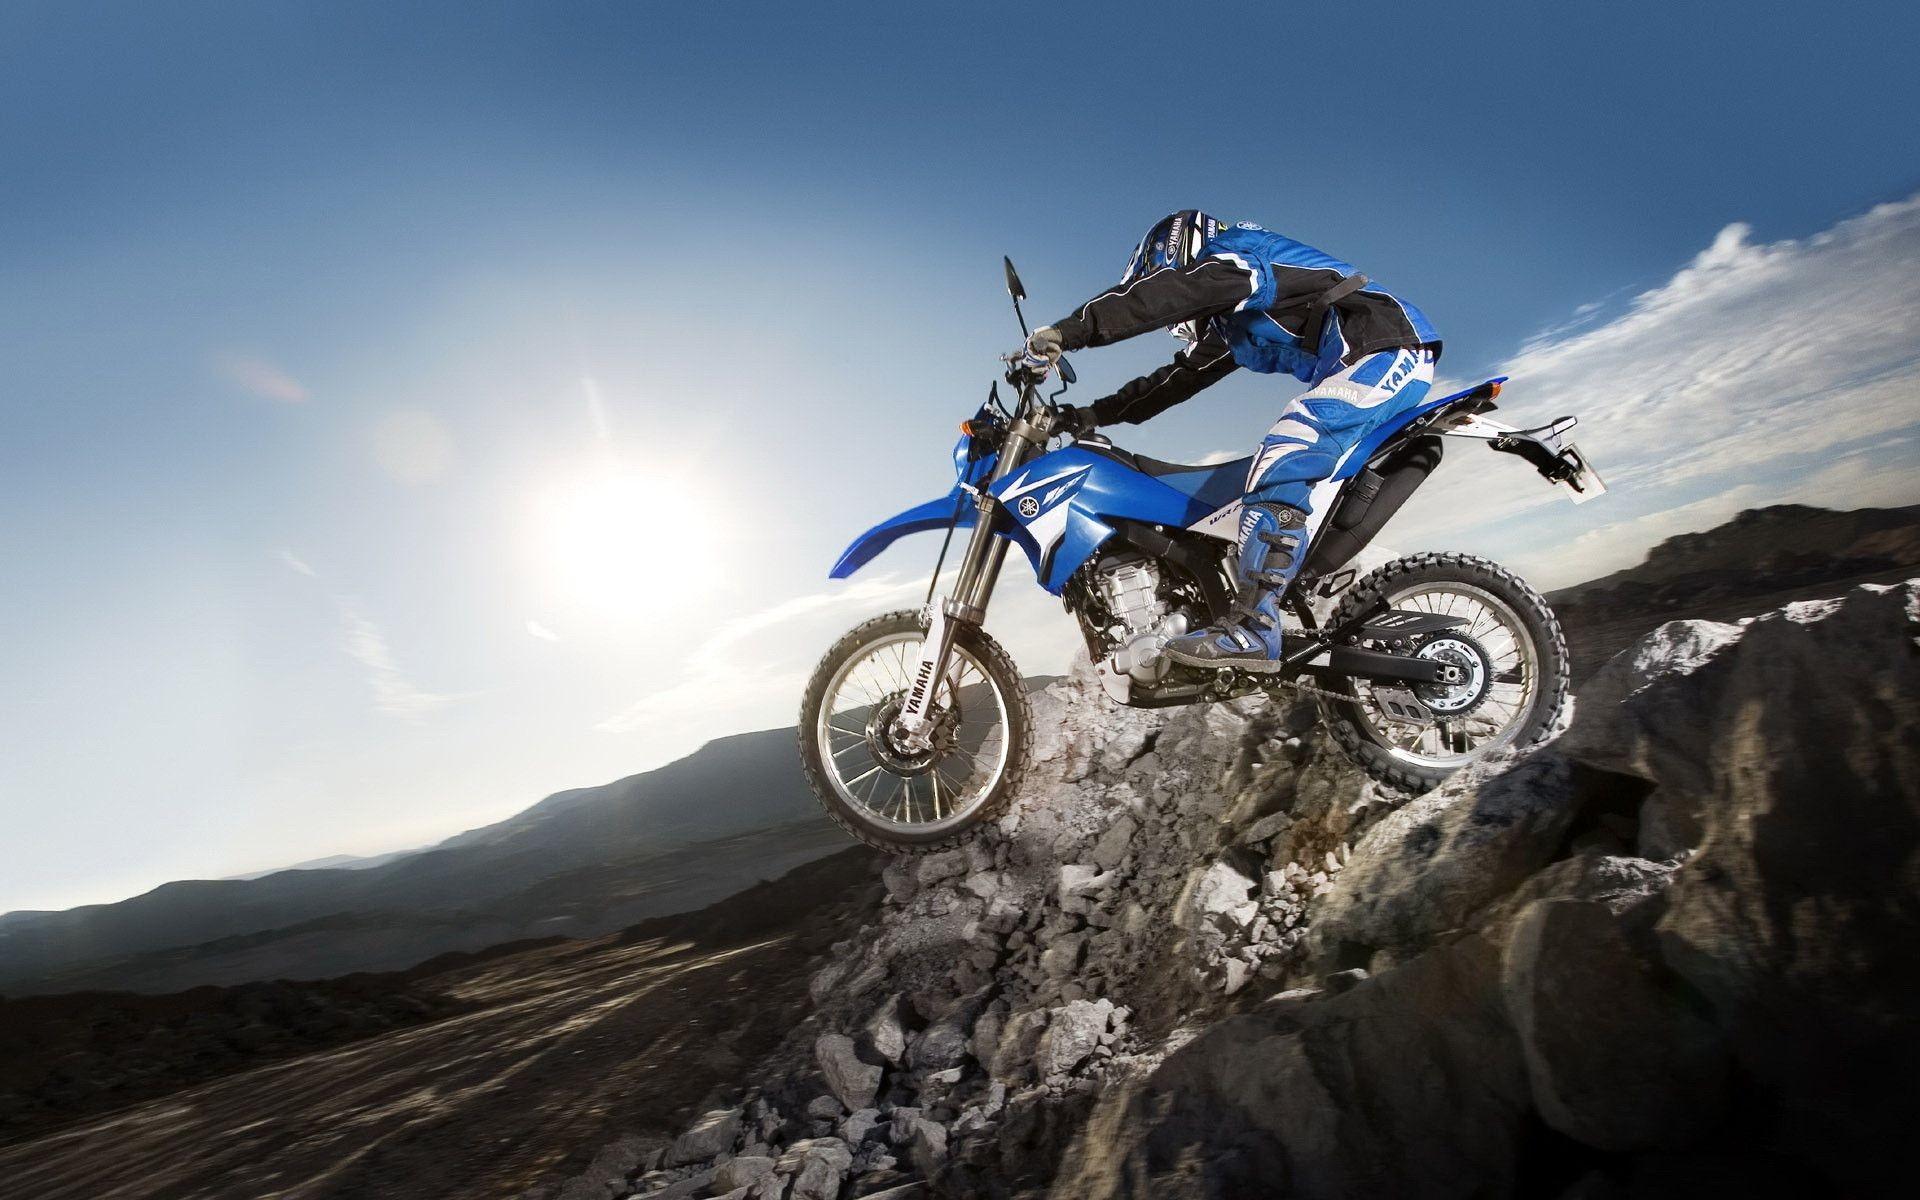 Motocross Screensavers Wallpapers (76+ images)